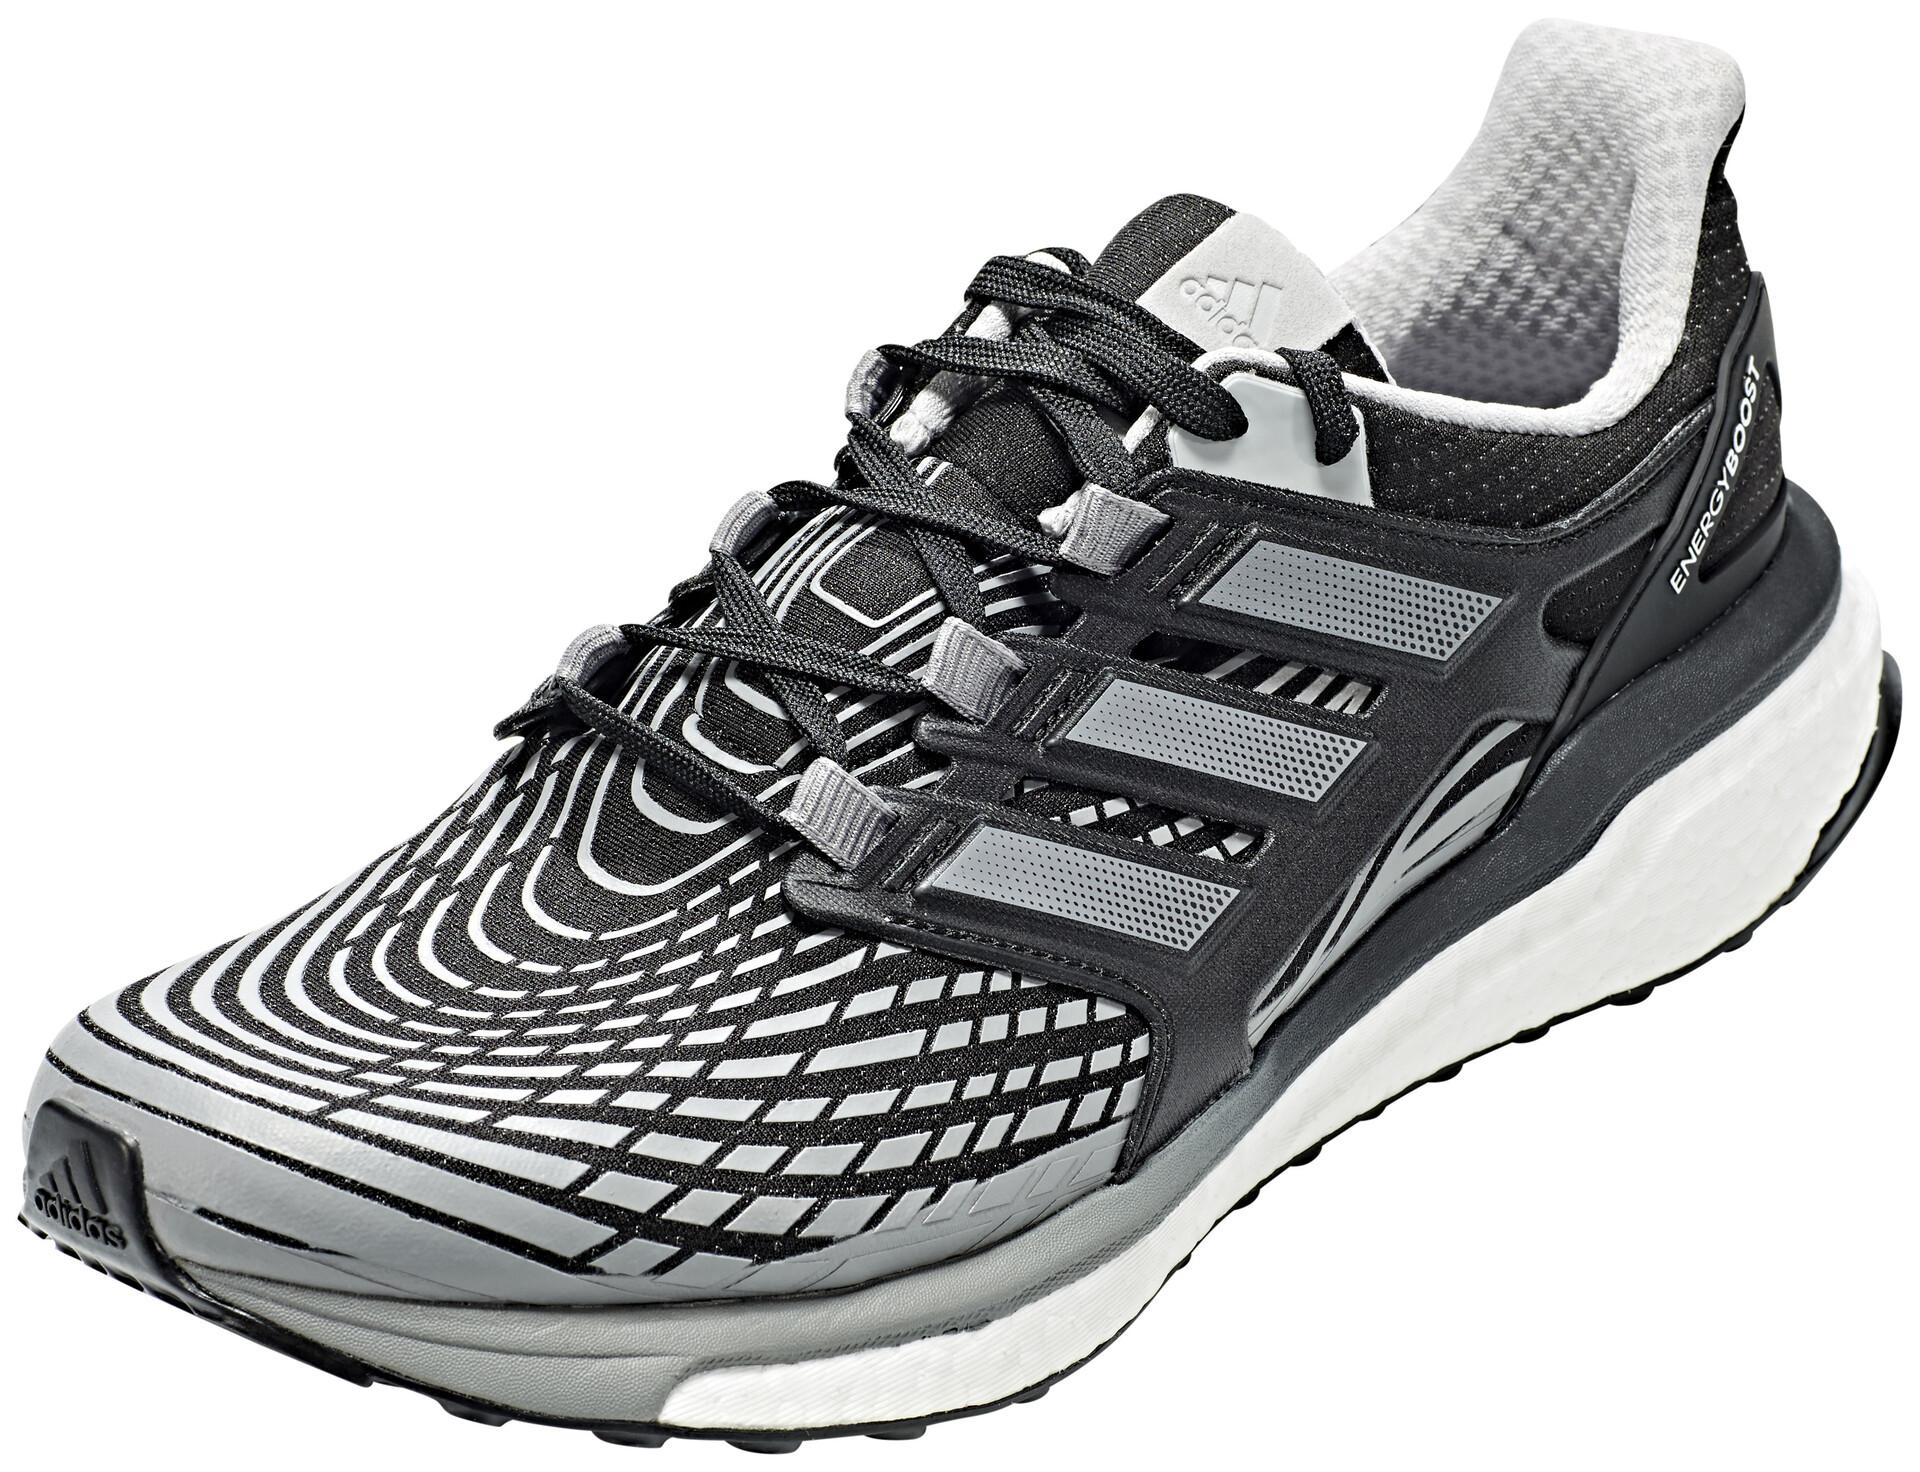 60bd6cbfe7ac3c ... get adidas energy boost zapatillas running hombre gris negro f49ea 1fd09